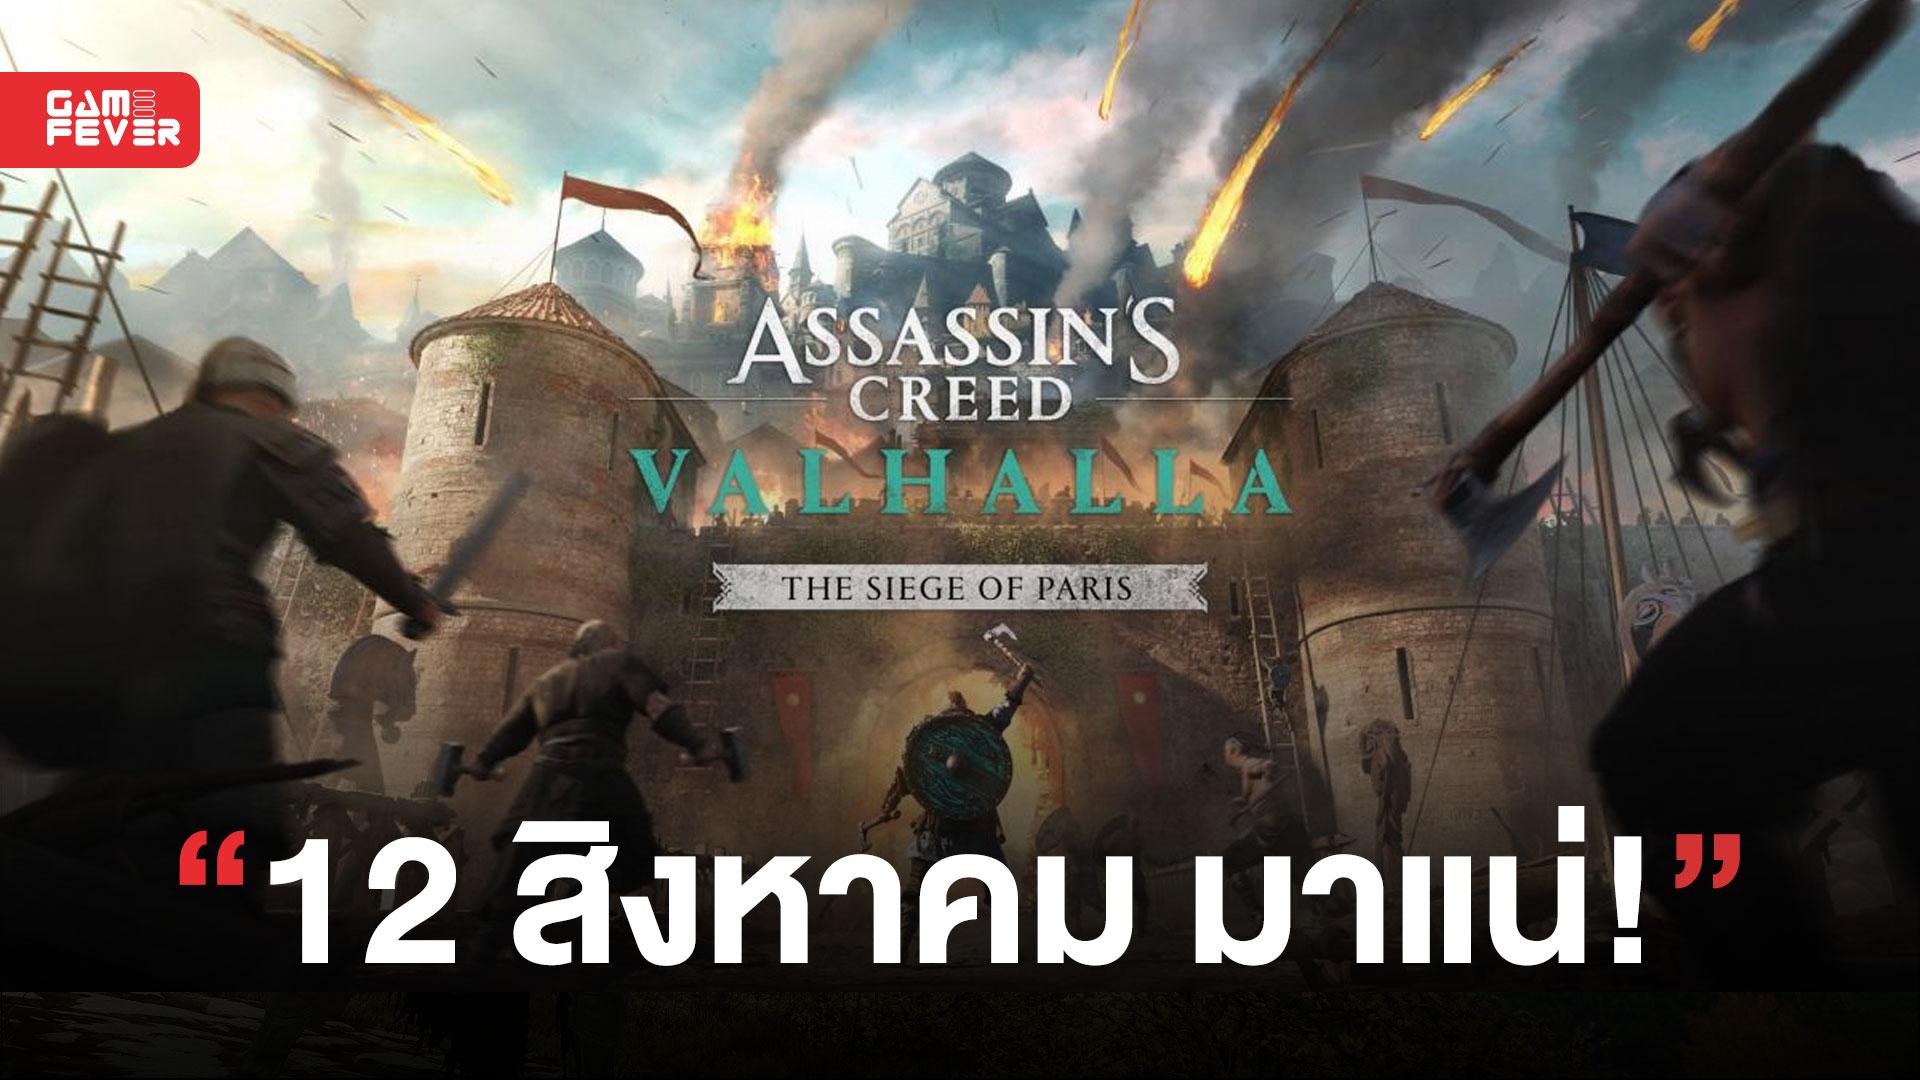 Assassins Creed Valhalla: The Siege of Paris จะมาในวันที่ 12 สิงหาคม